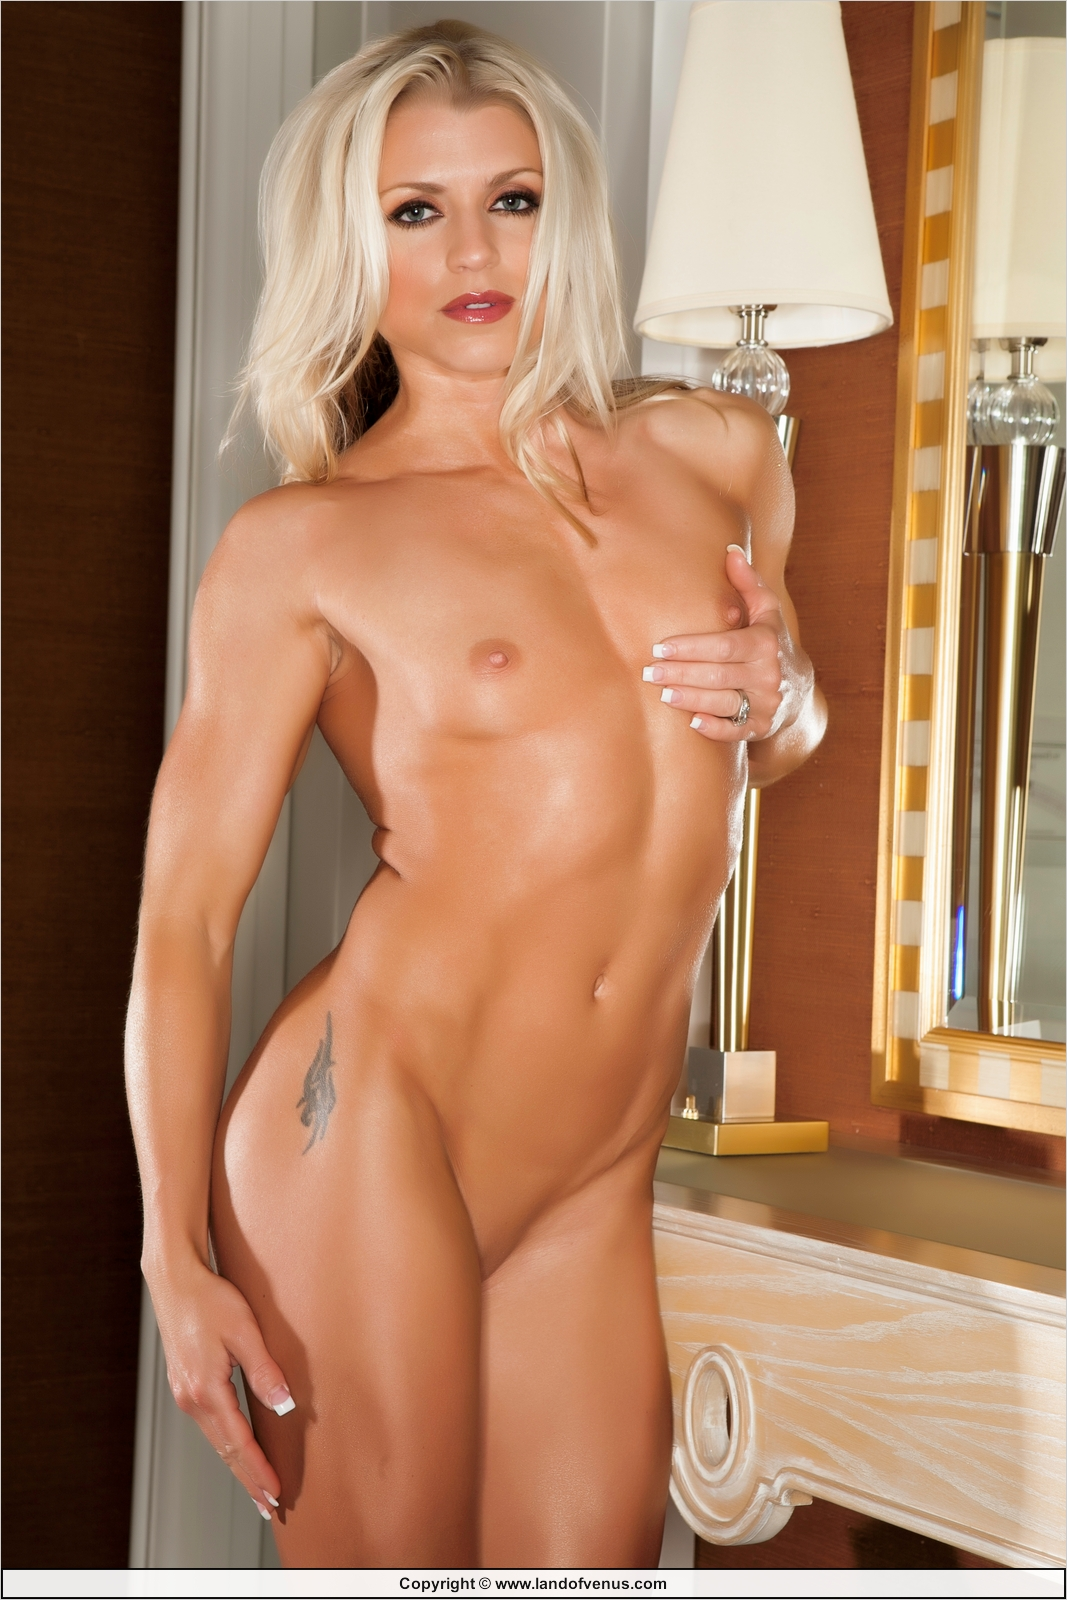 Fawnia mondey nude